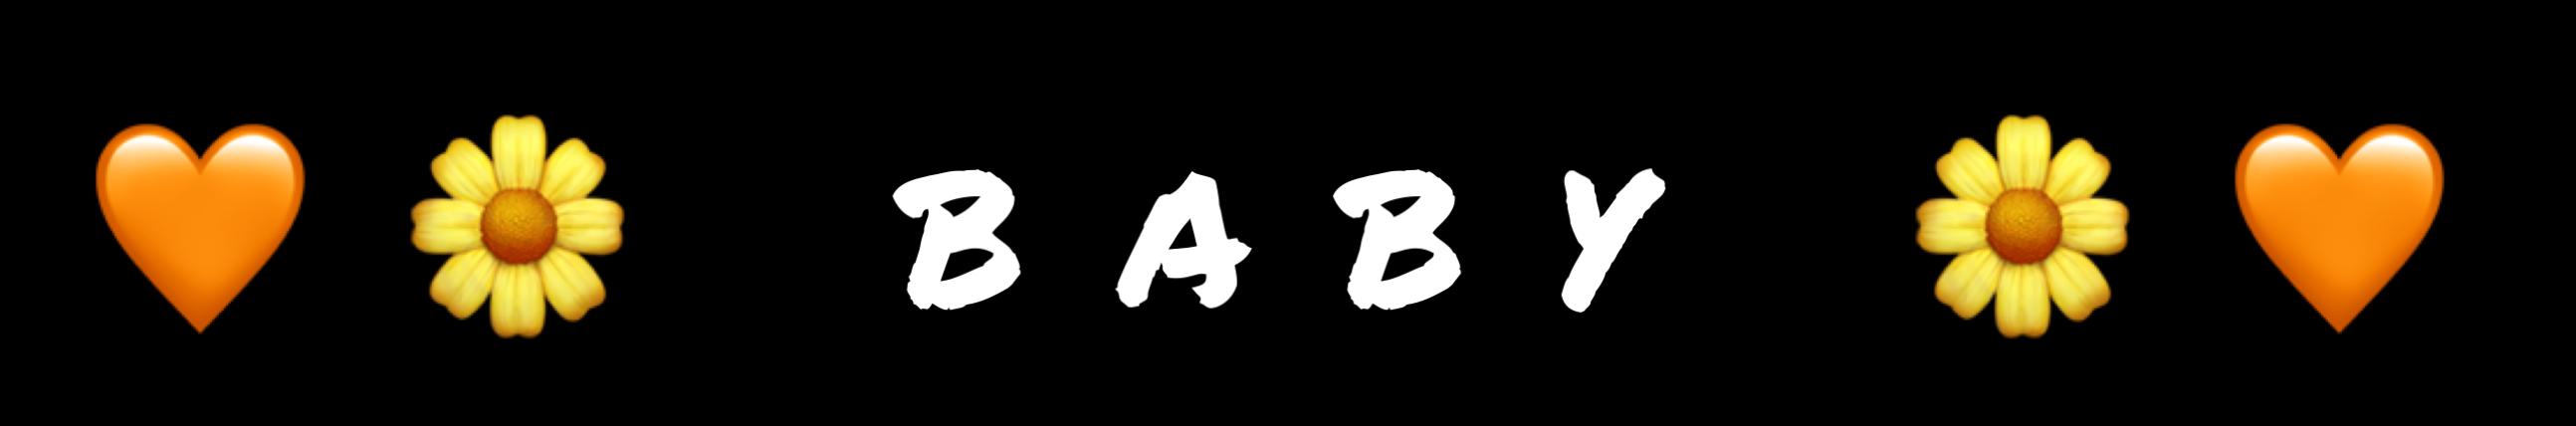 #Baby #🧡 #🌼 #Цитата #Надпись #Чёрный #Цветок #Сердце #Френдзона #Бэйби